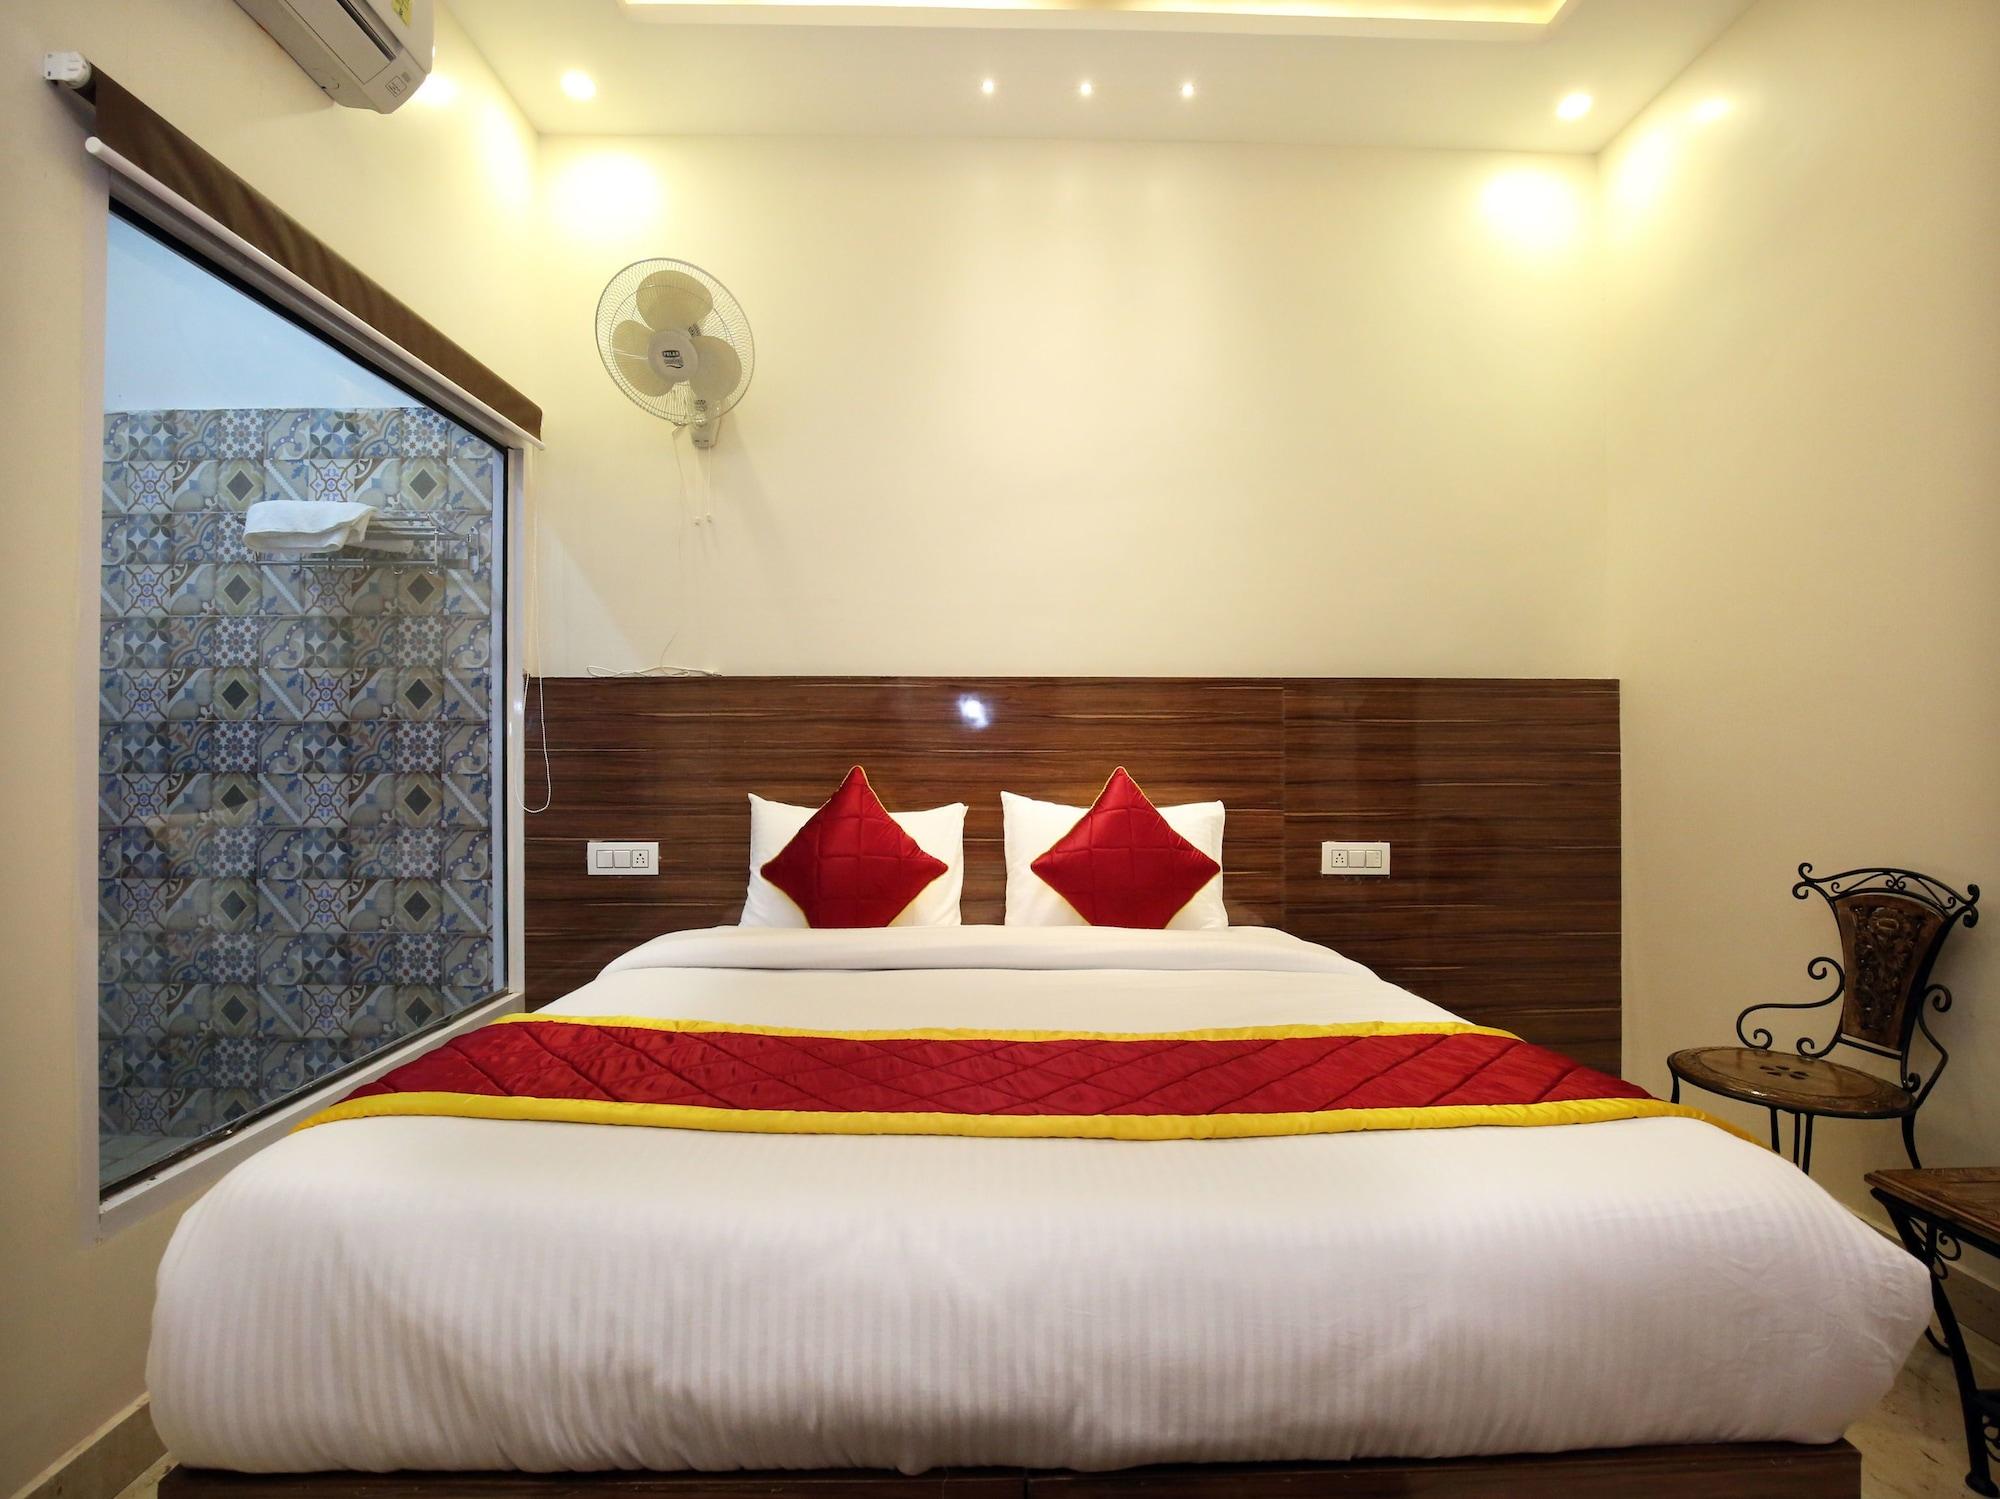 OYO 9159 Hotel Royal Woods, Panchkula